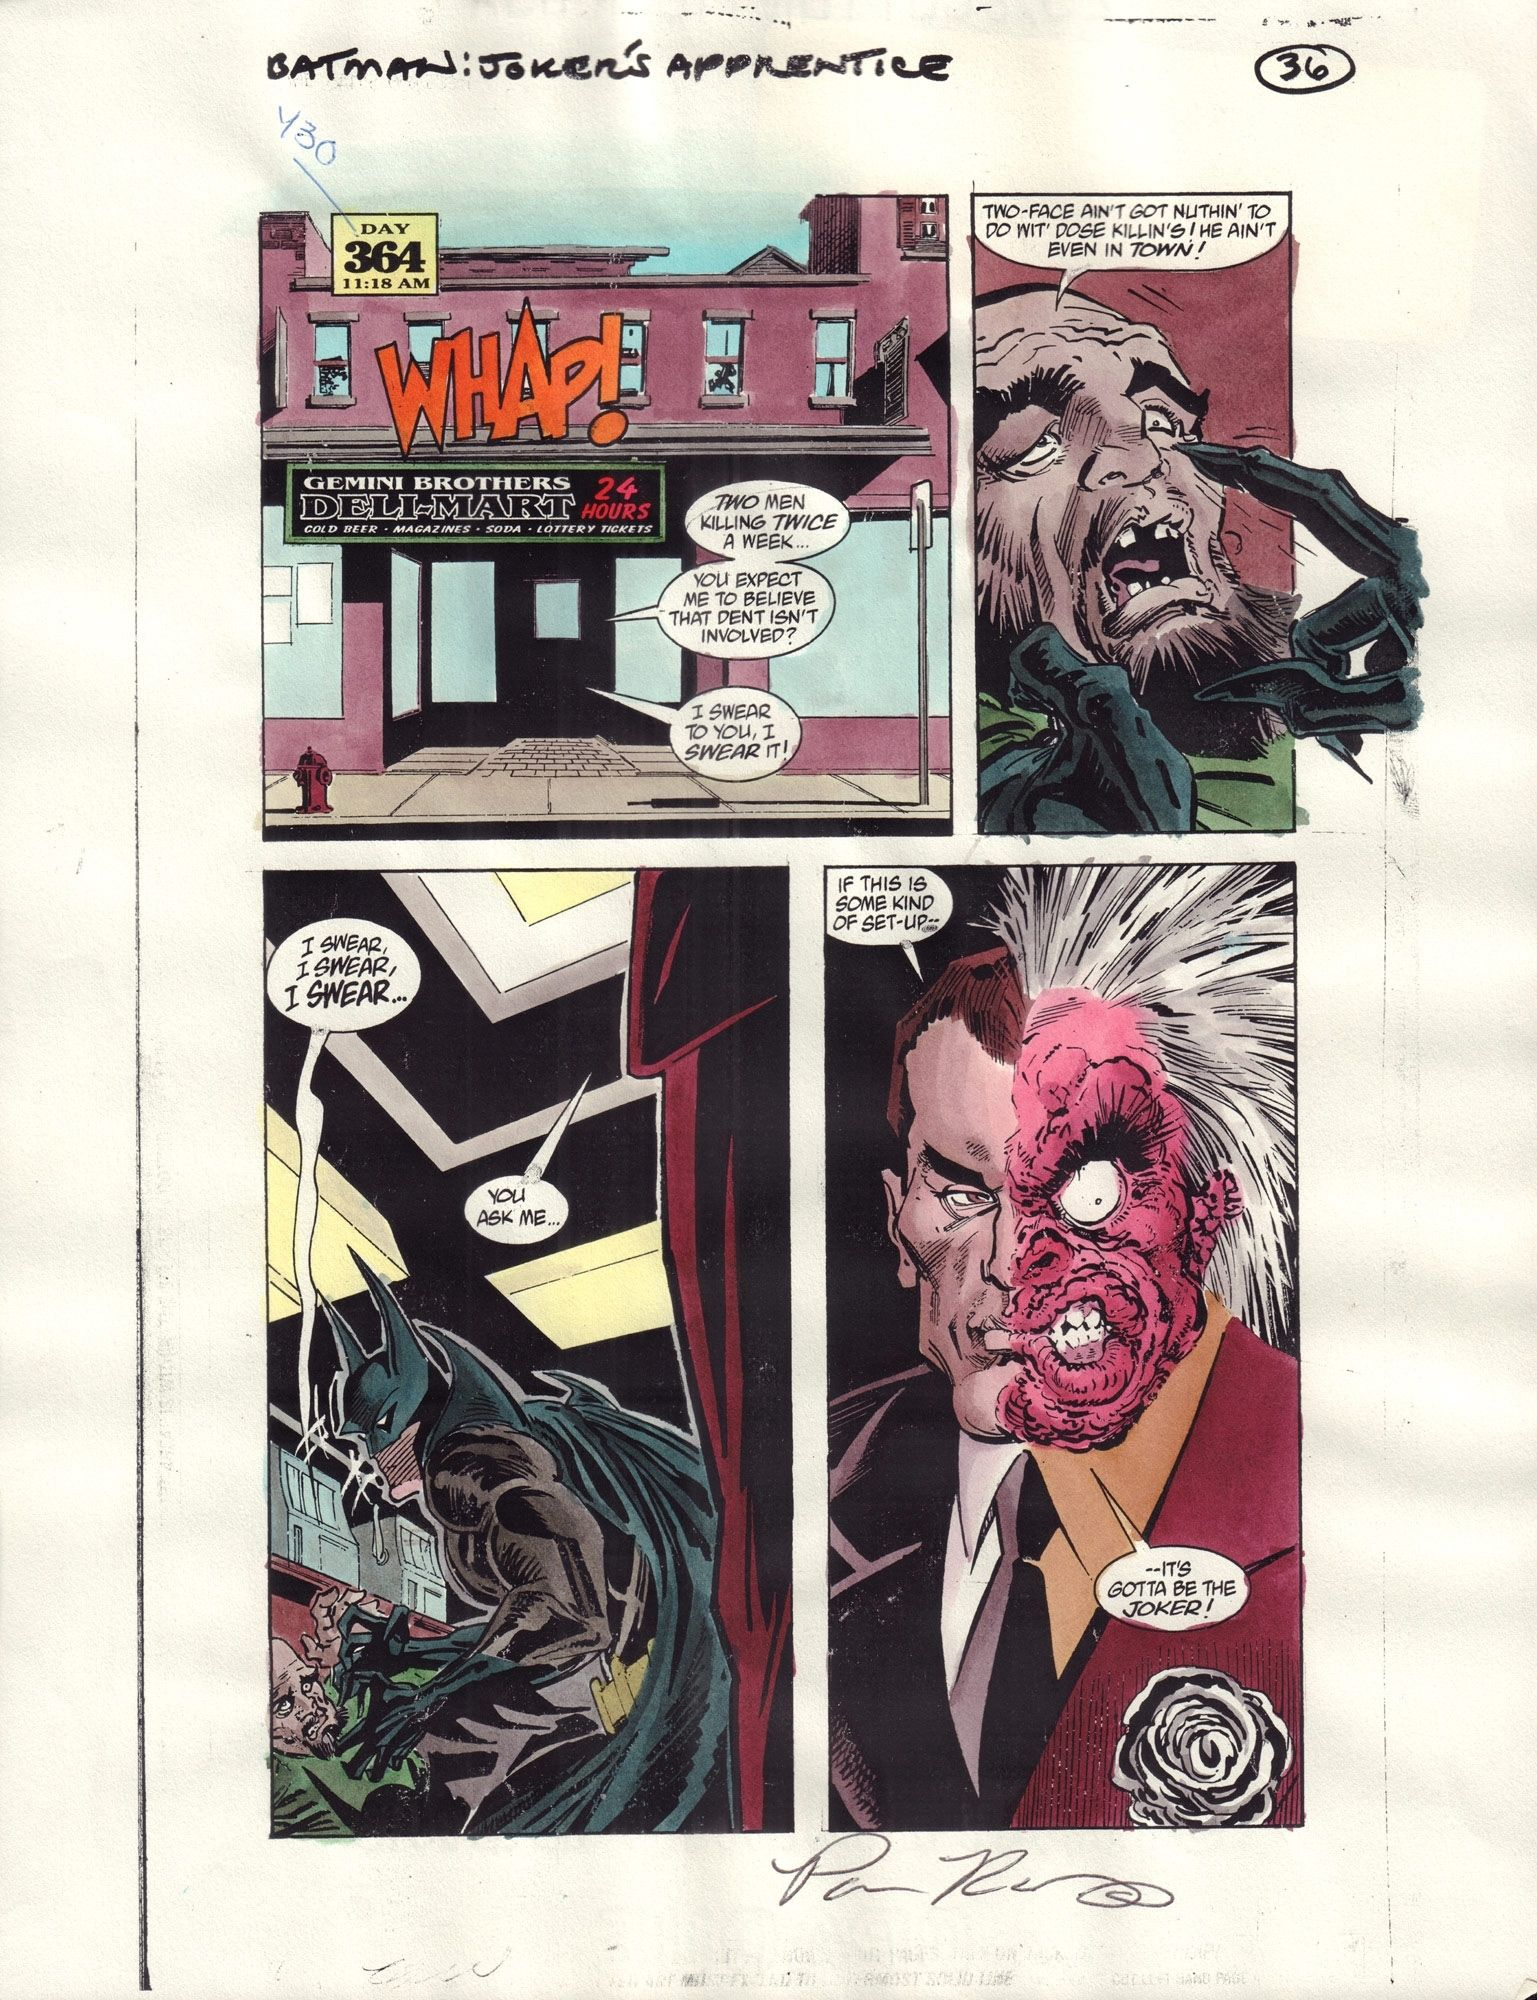 Batman: Joker's Apprentice #1 / 36